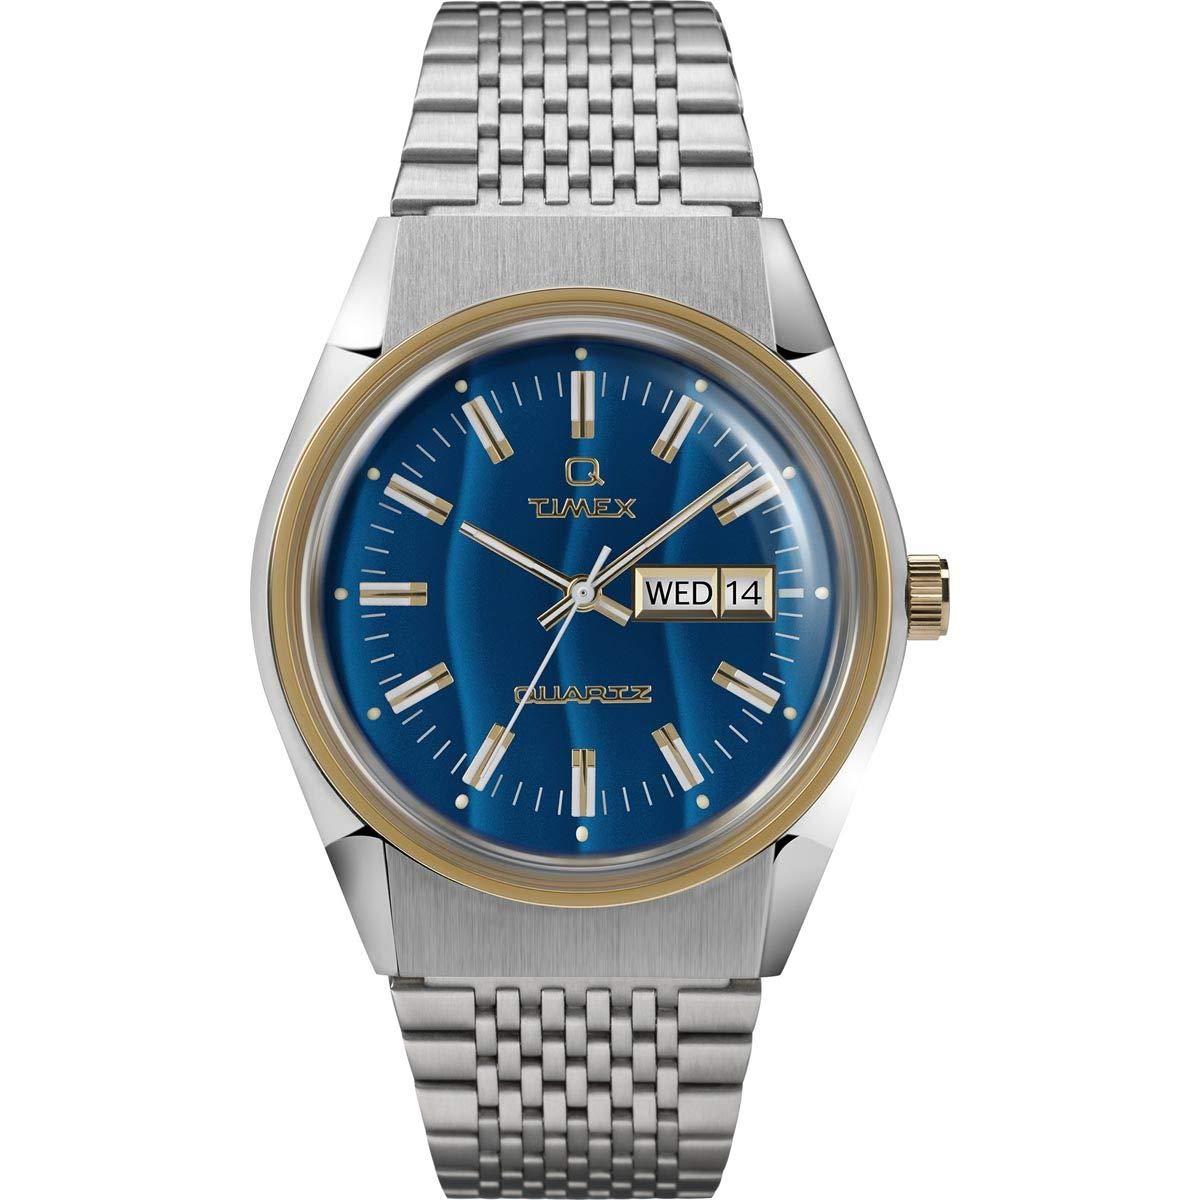 Timex Q Reissue Falcon Eye Analog Blue Dial Men's Watch TW2T80800 Wrist Watches